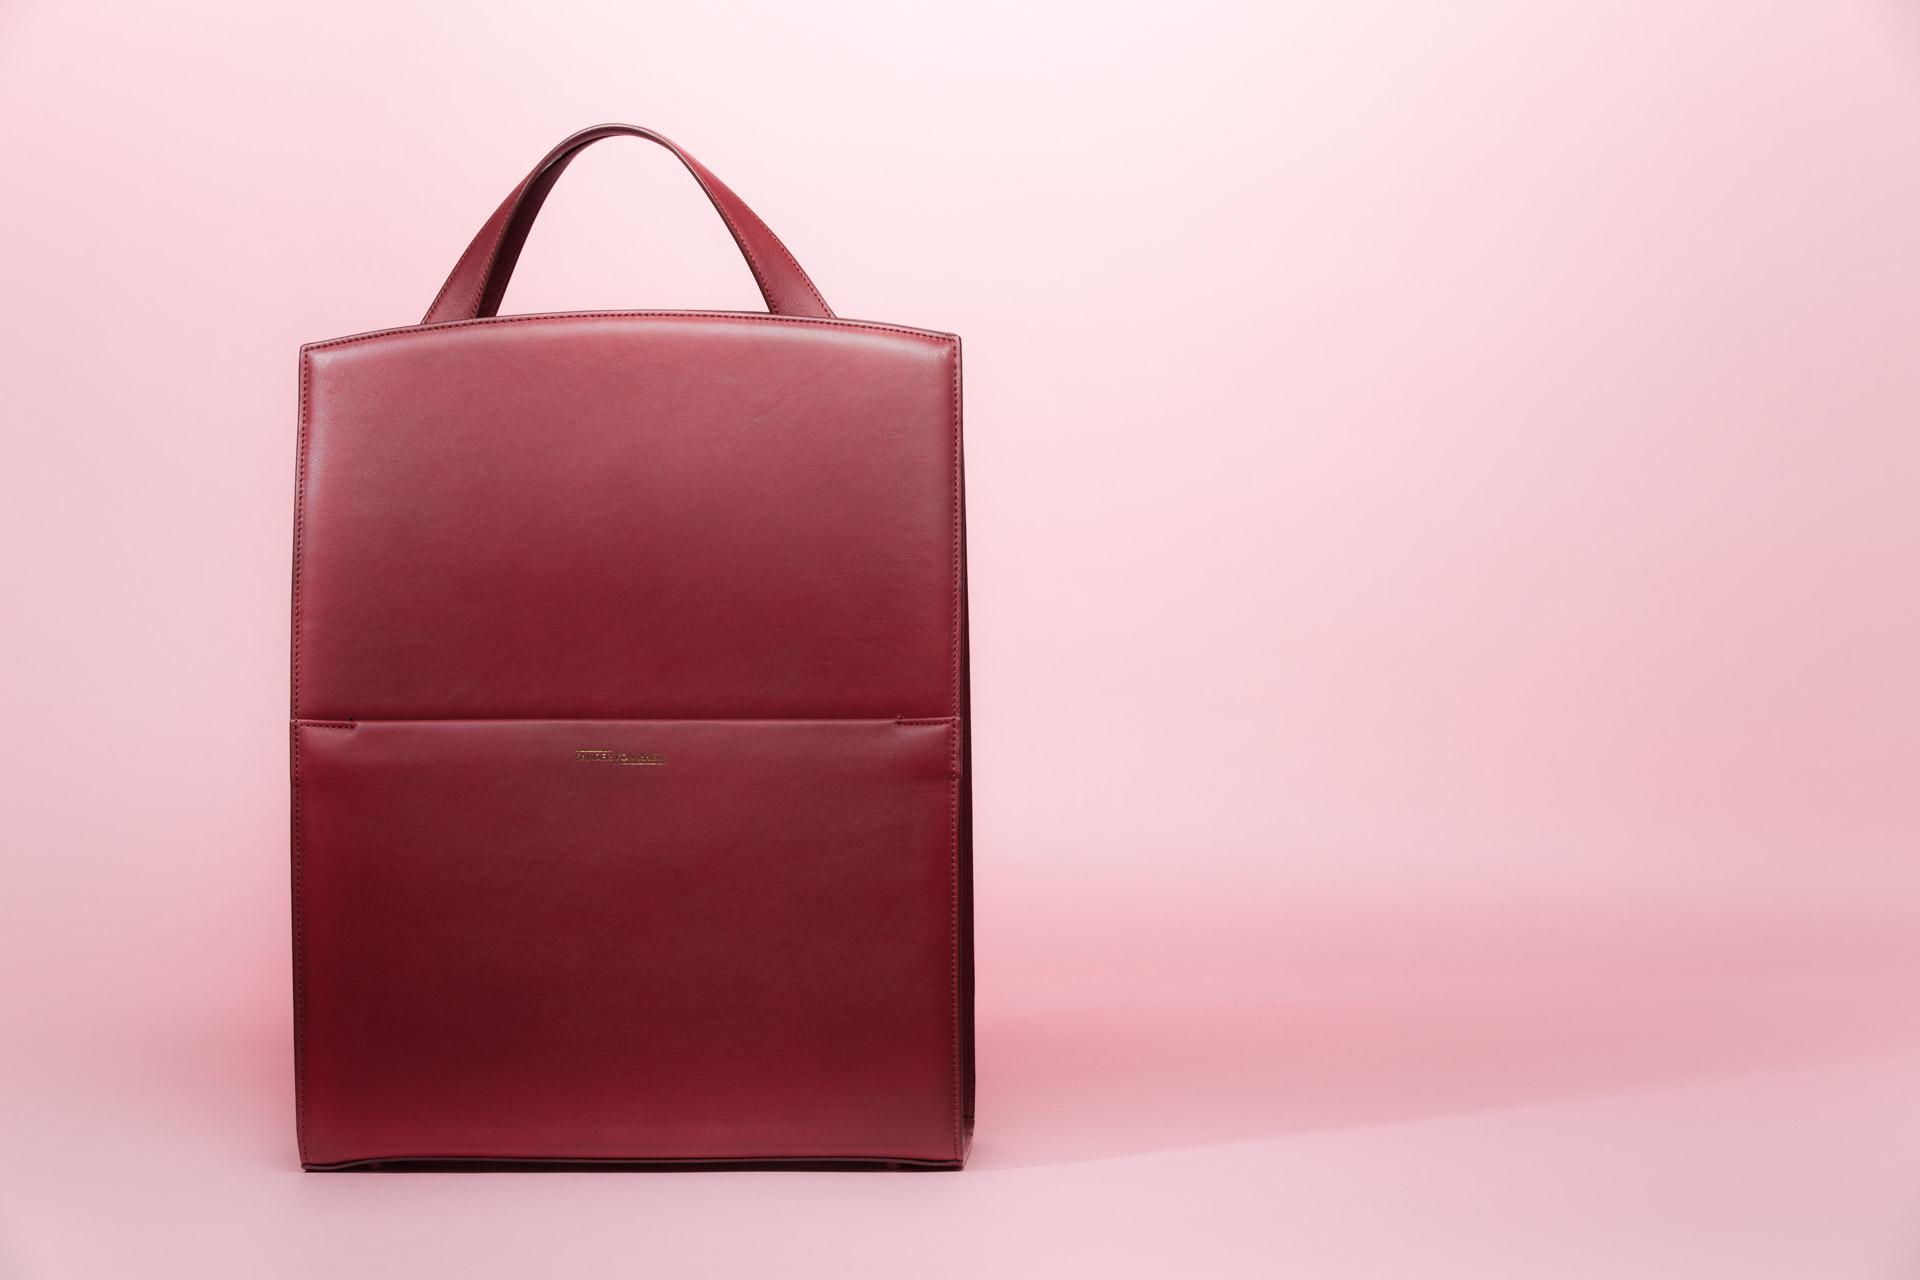 WEB Backup bags shop presentation-21.jpg